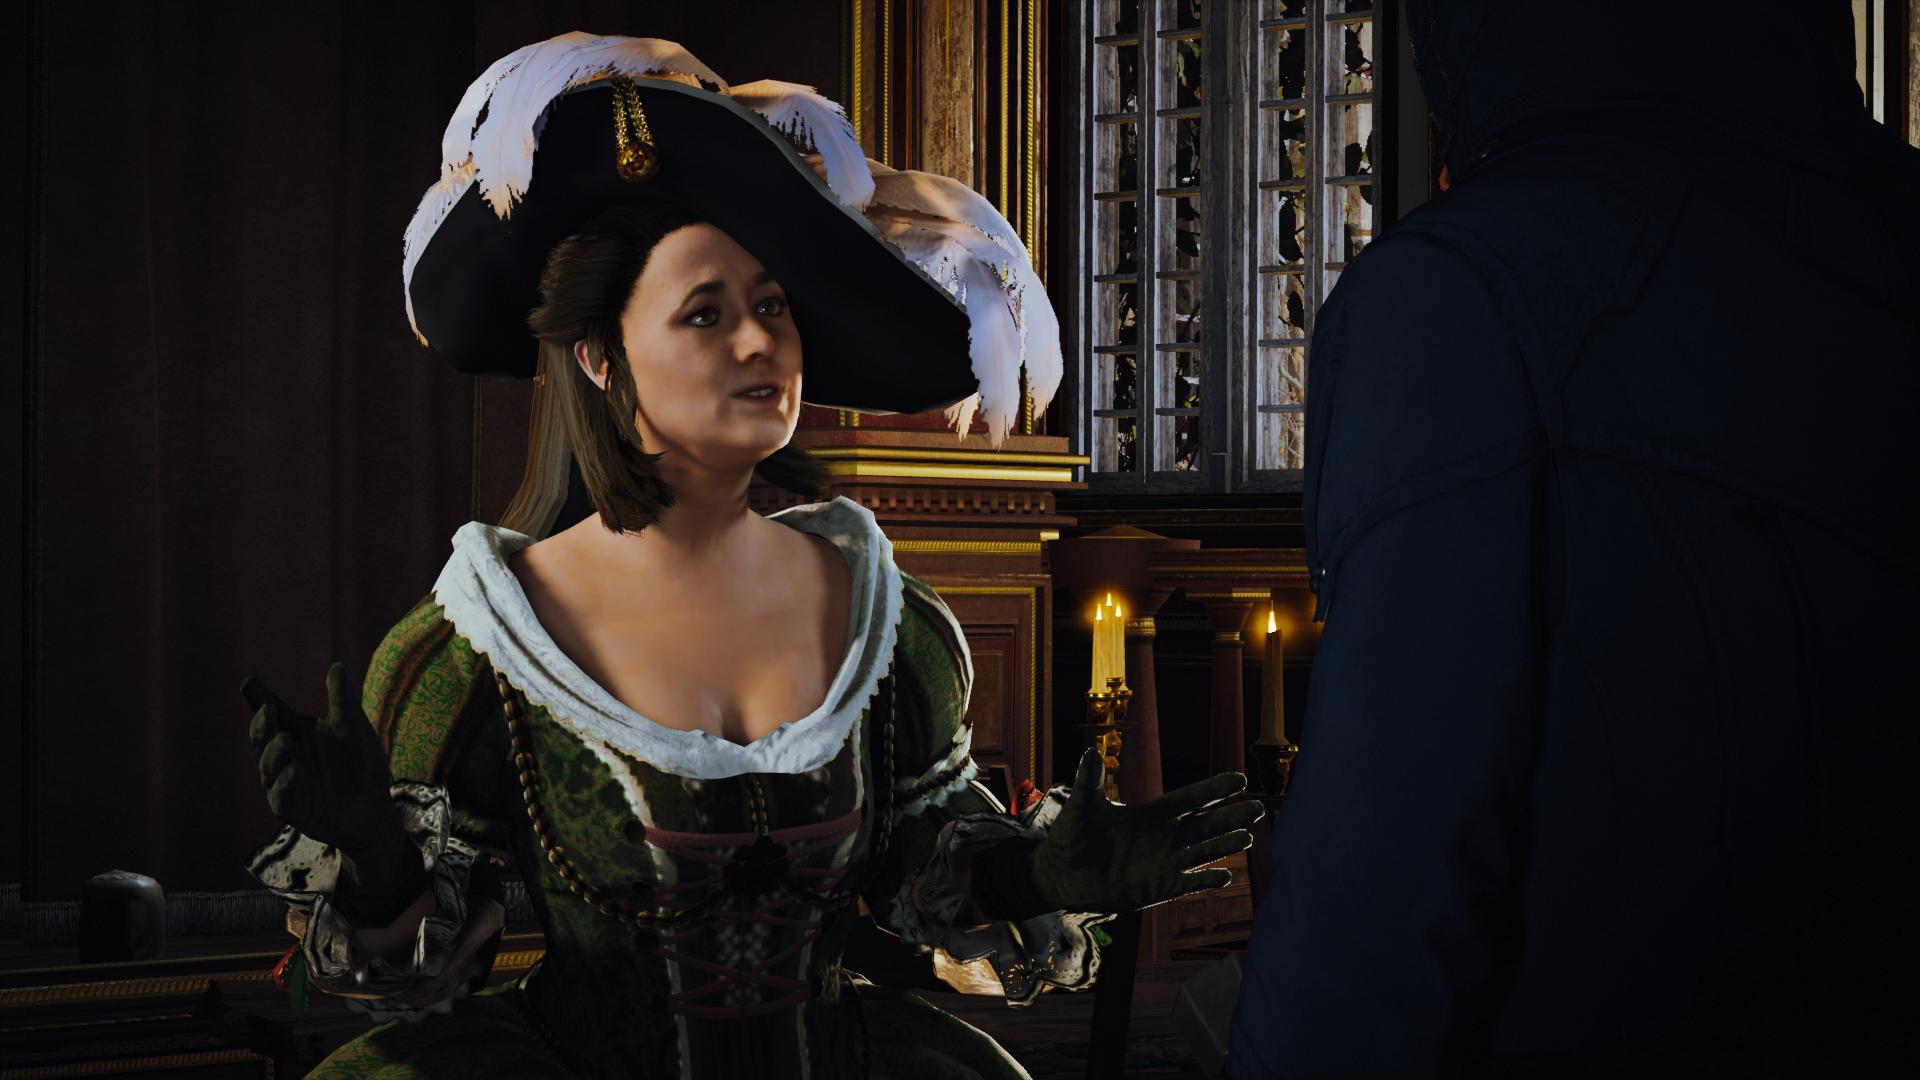 Charlotte Gouze Assassin S Creed Wiki Fandom Powered